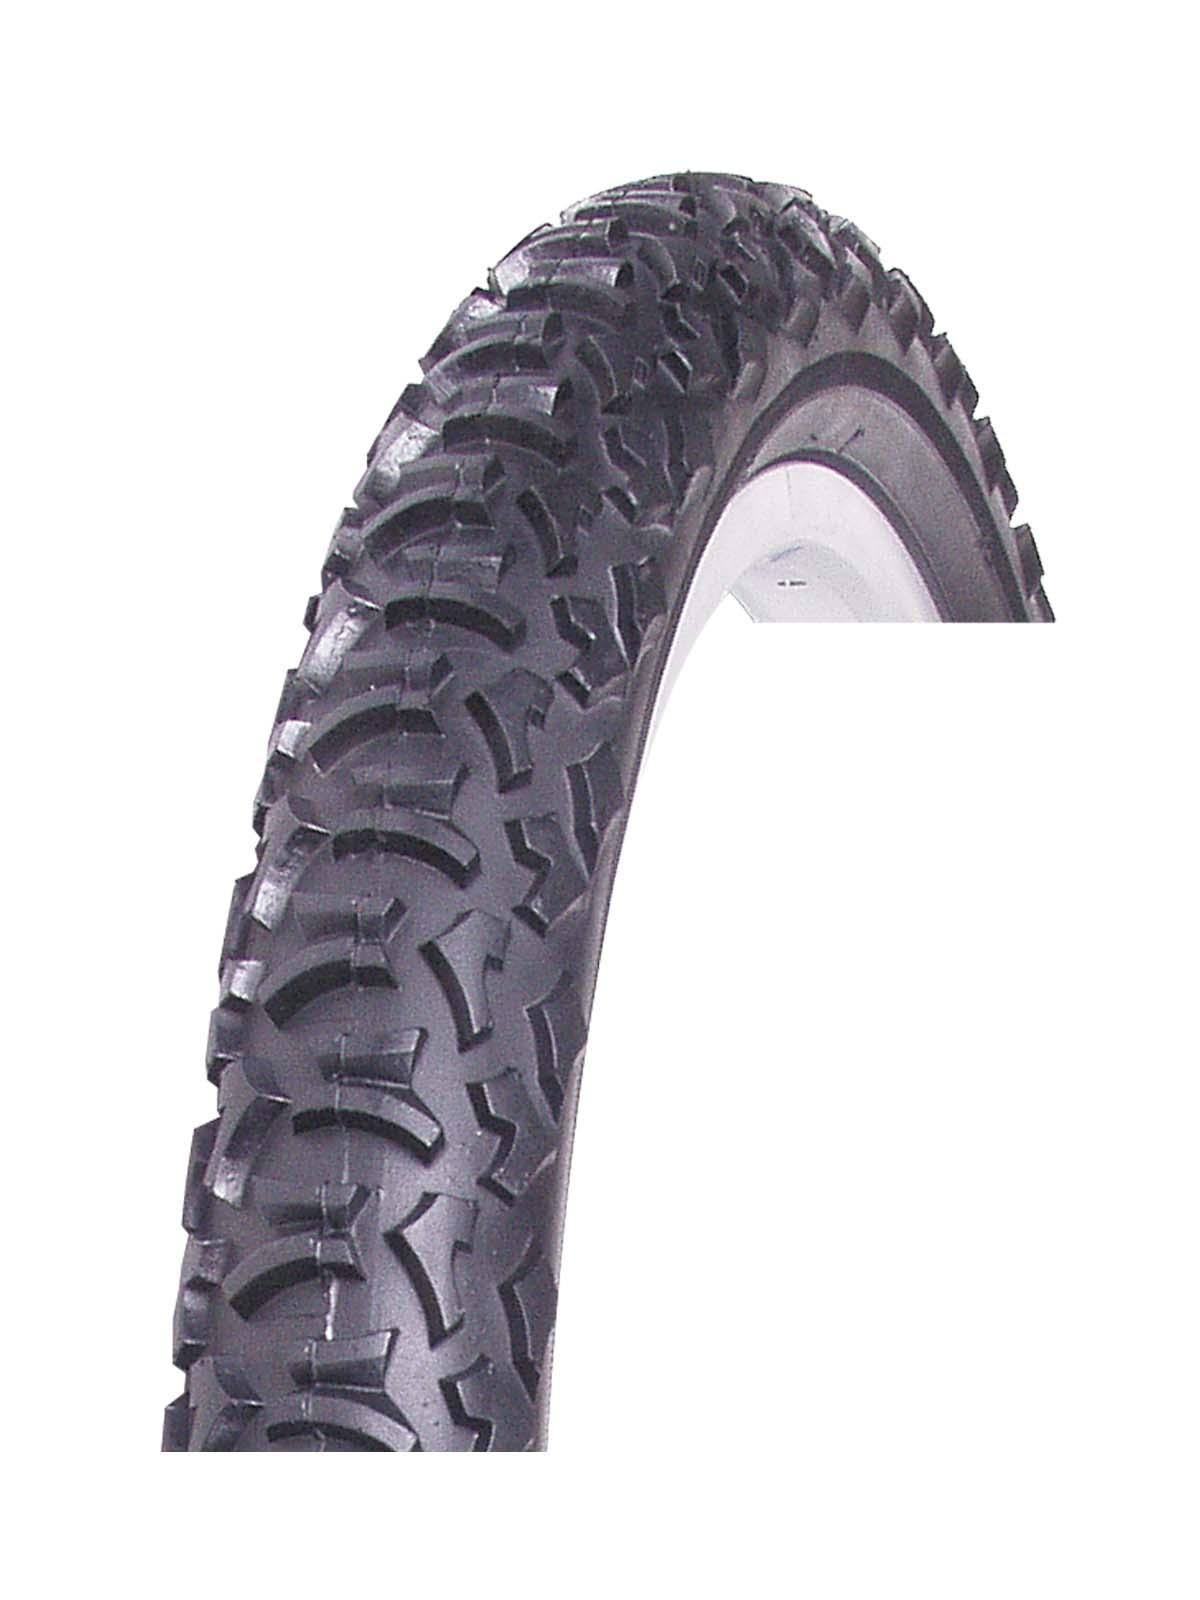 VEE RUBBER - Външна гума Vee Rubber 16x2,125 VRB090